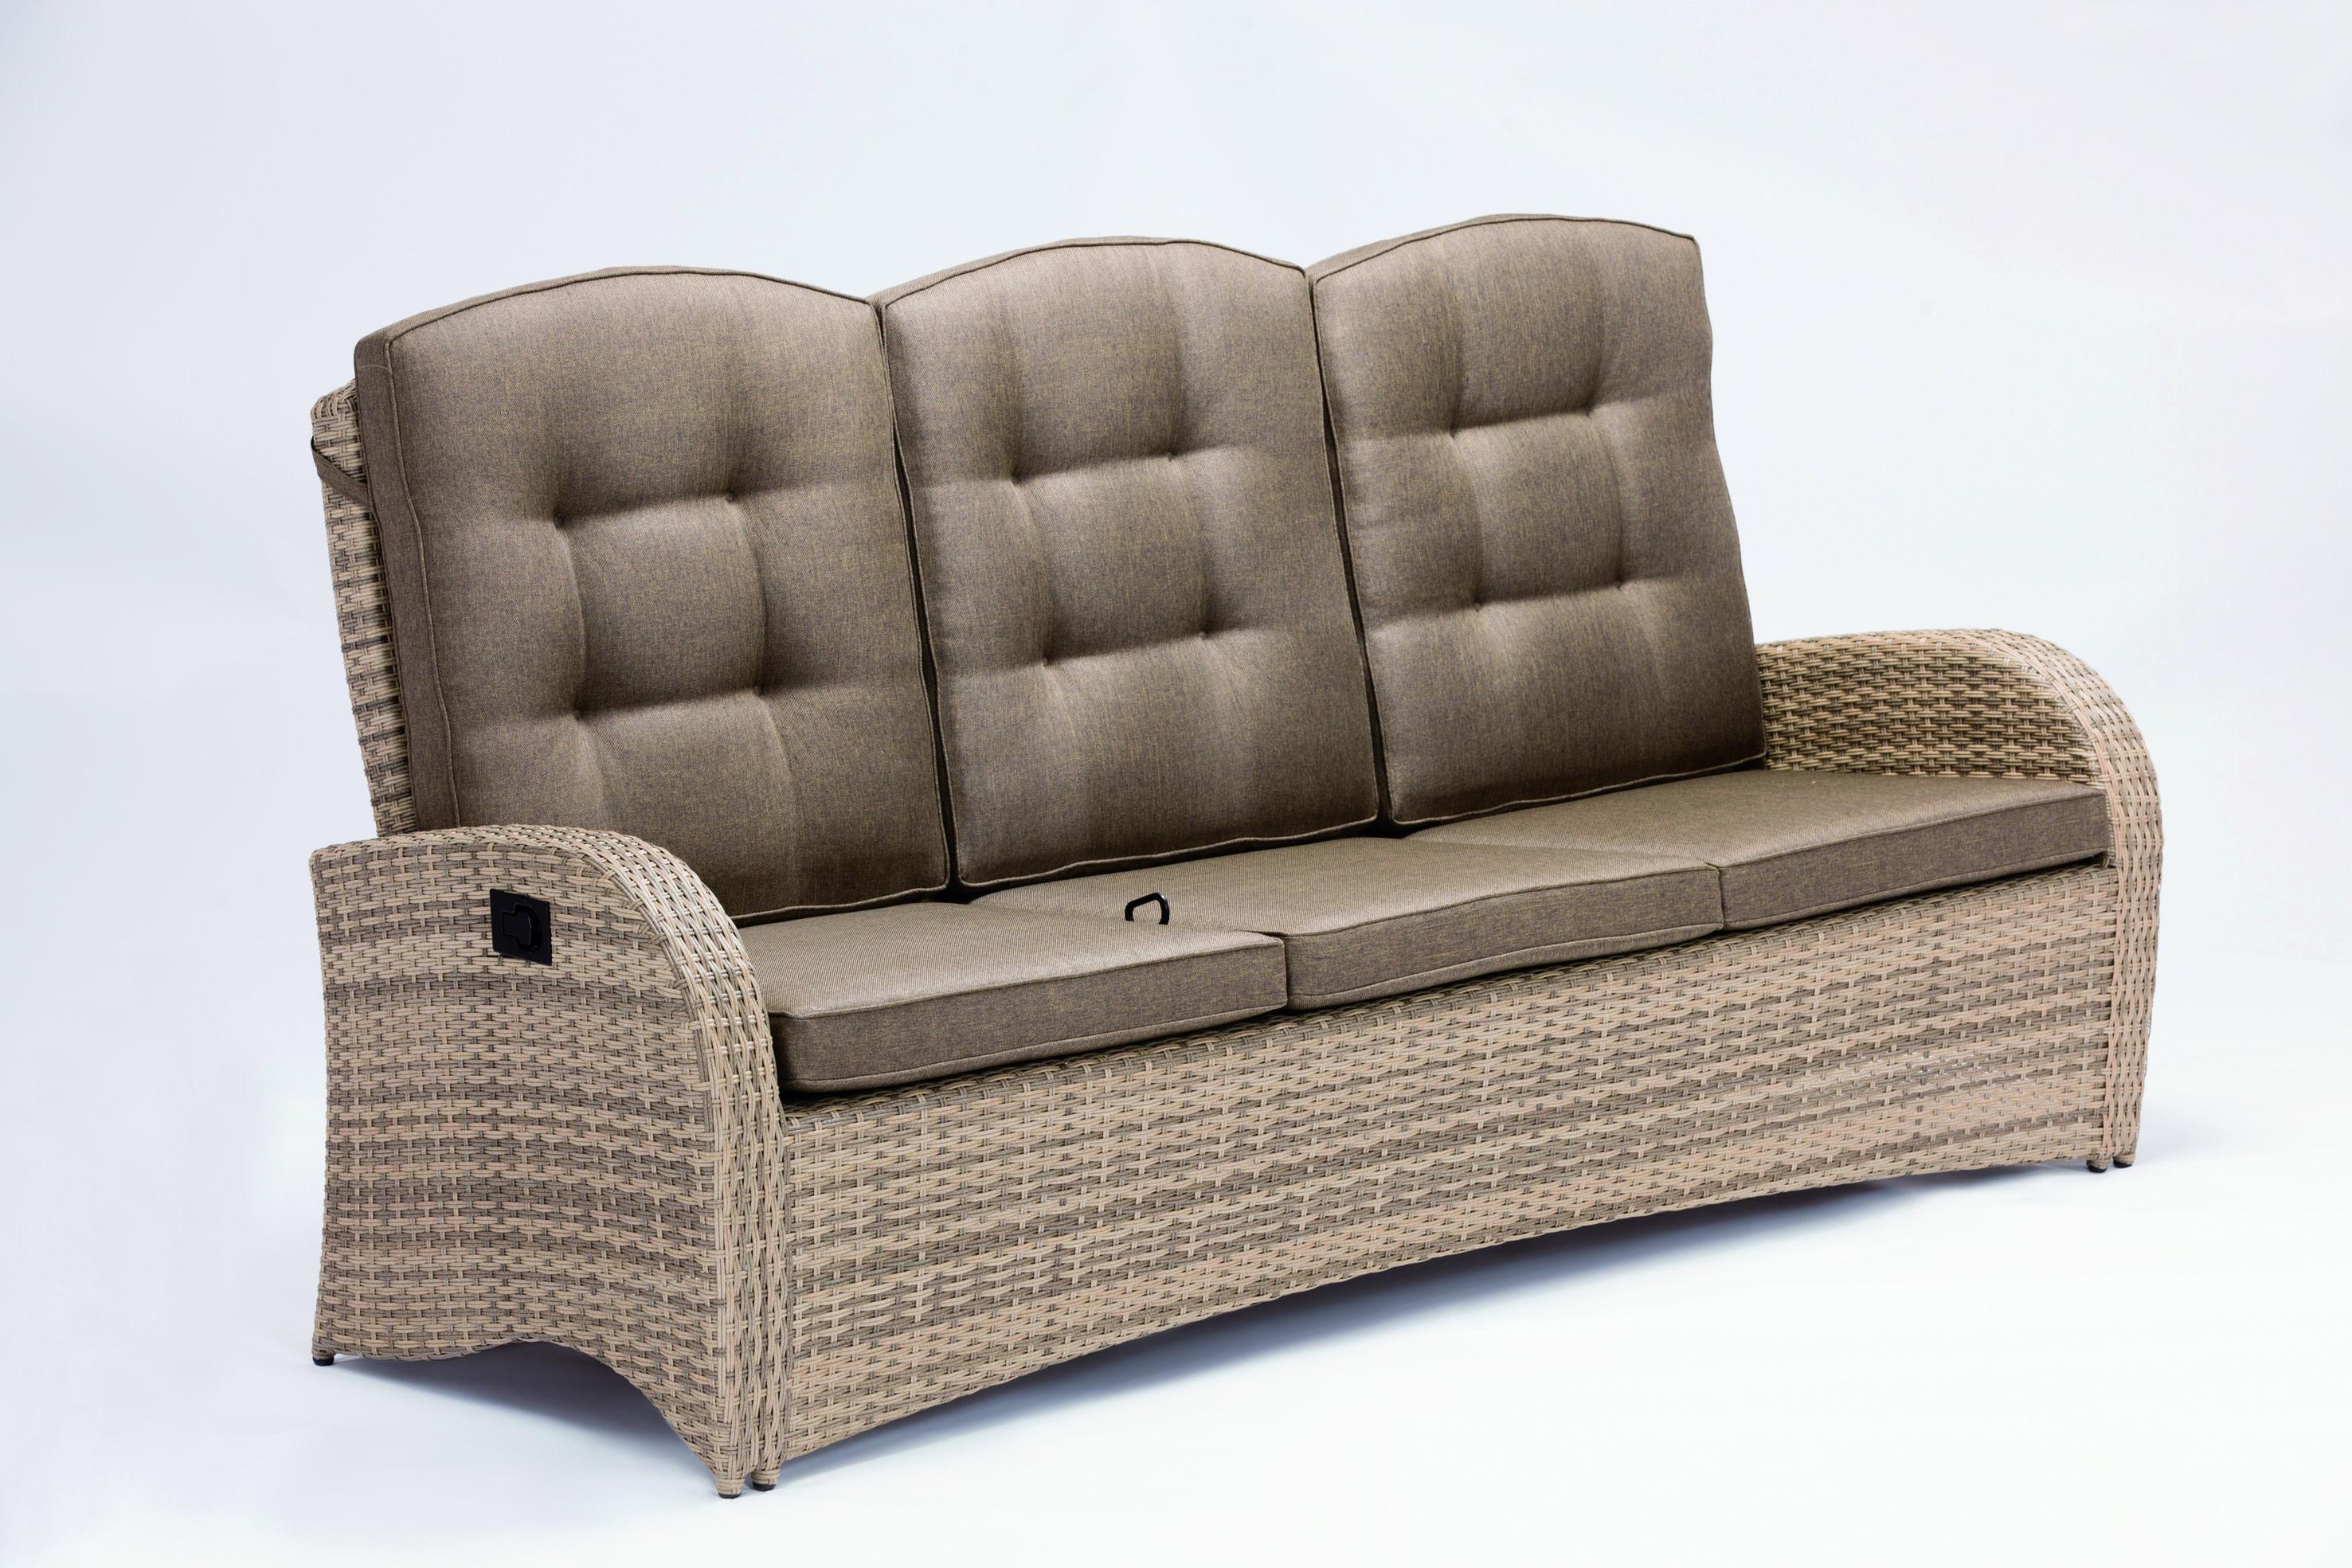 3er Sofa Aus Der Turin Serie Aus Polyrattan Gartenmobel Gartensofa Garten Terrasse Wintergarten Couch Sofa Rattan Furniture Set Furniture 3 Seater Sofa